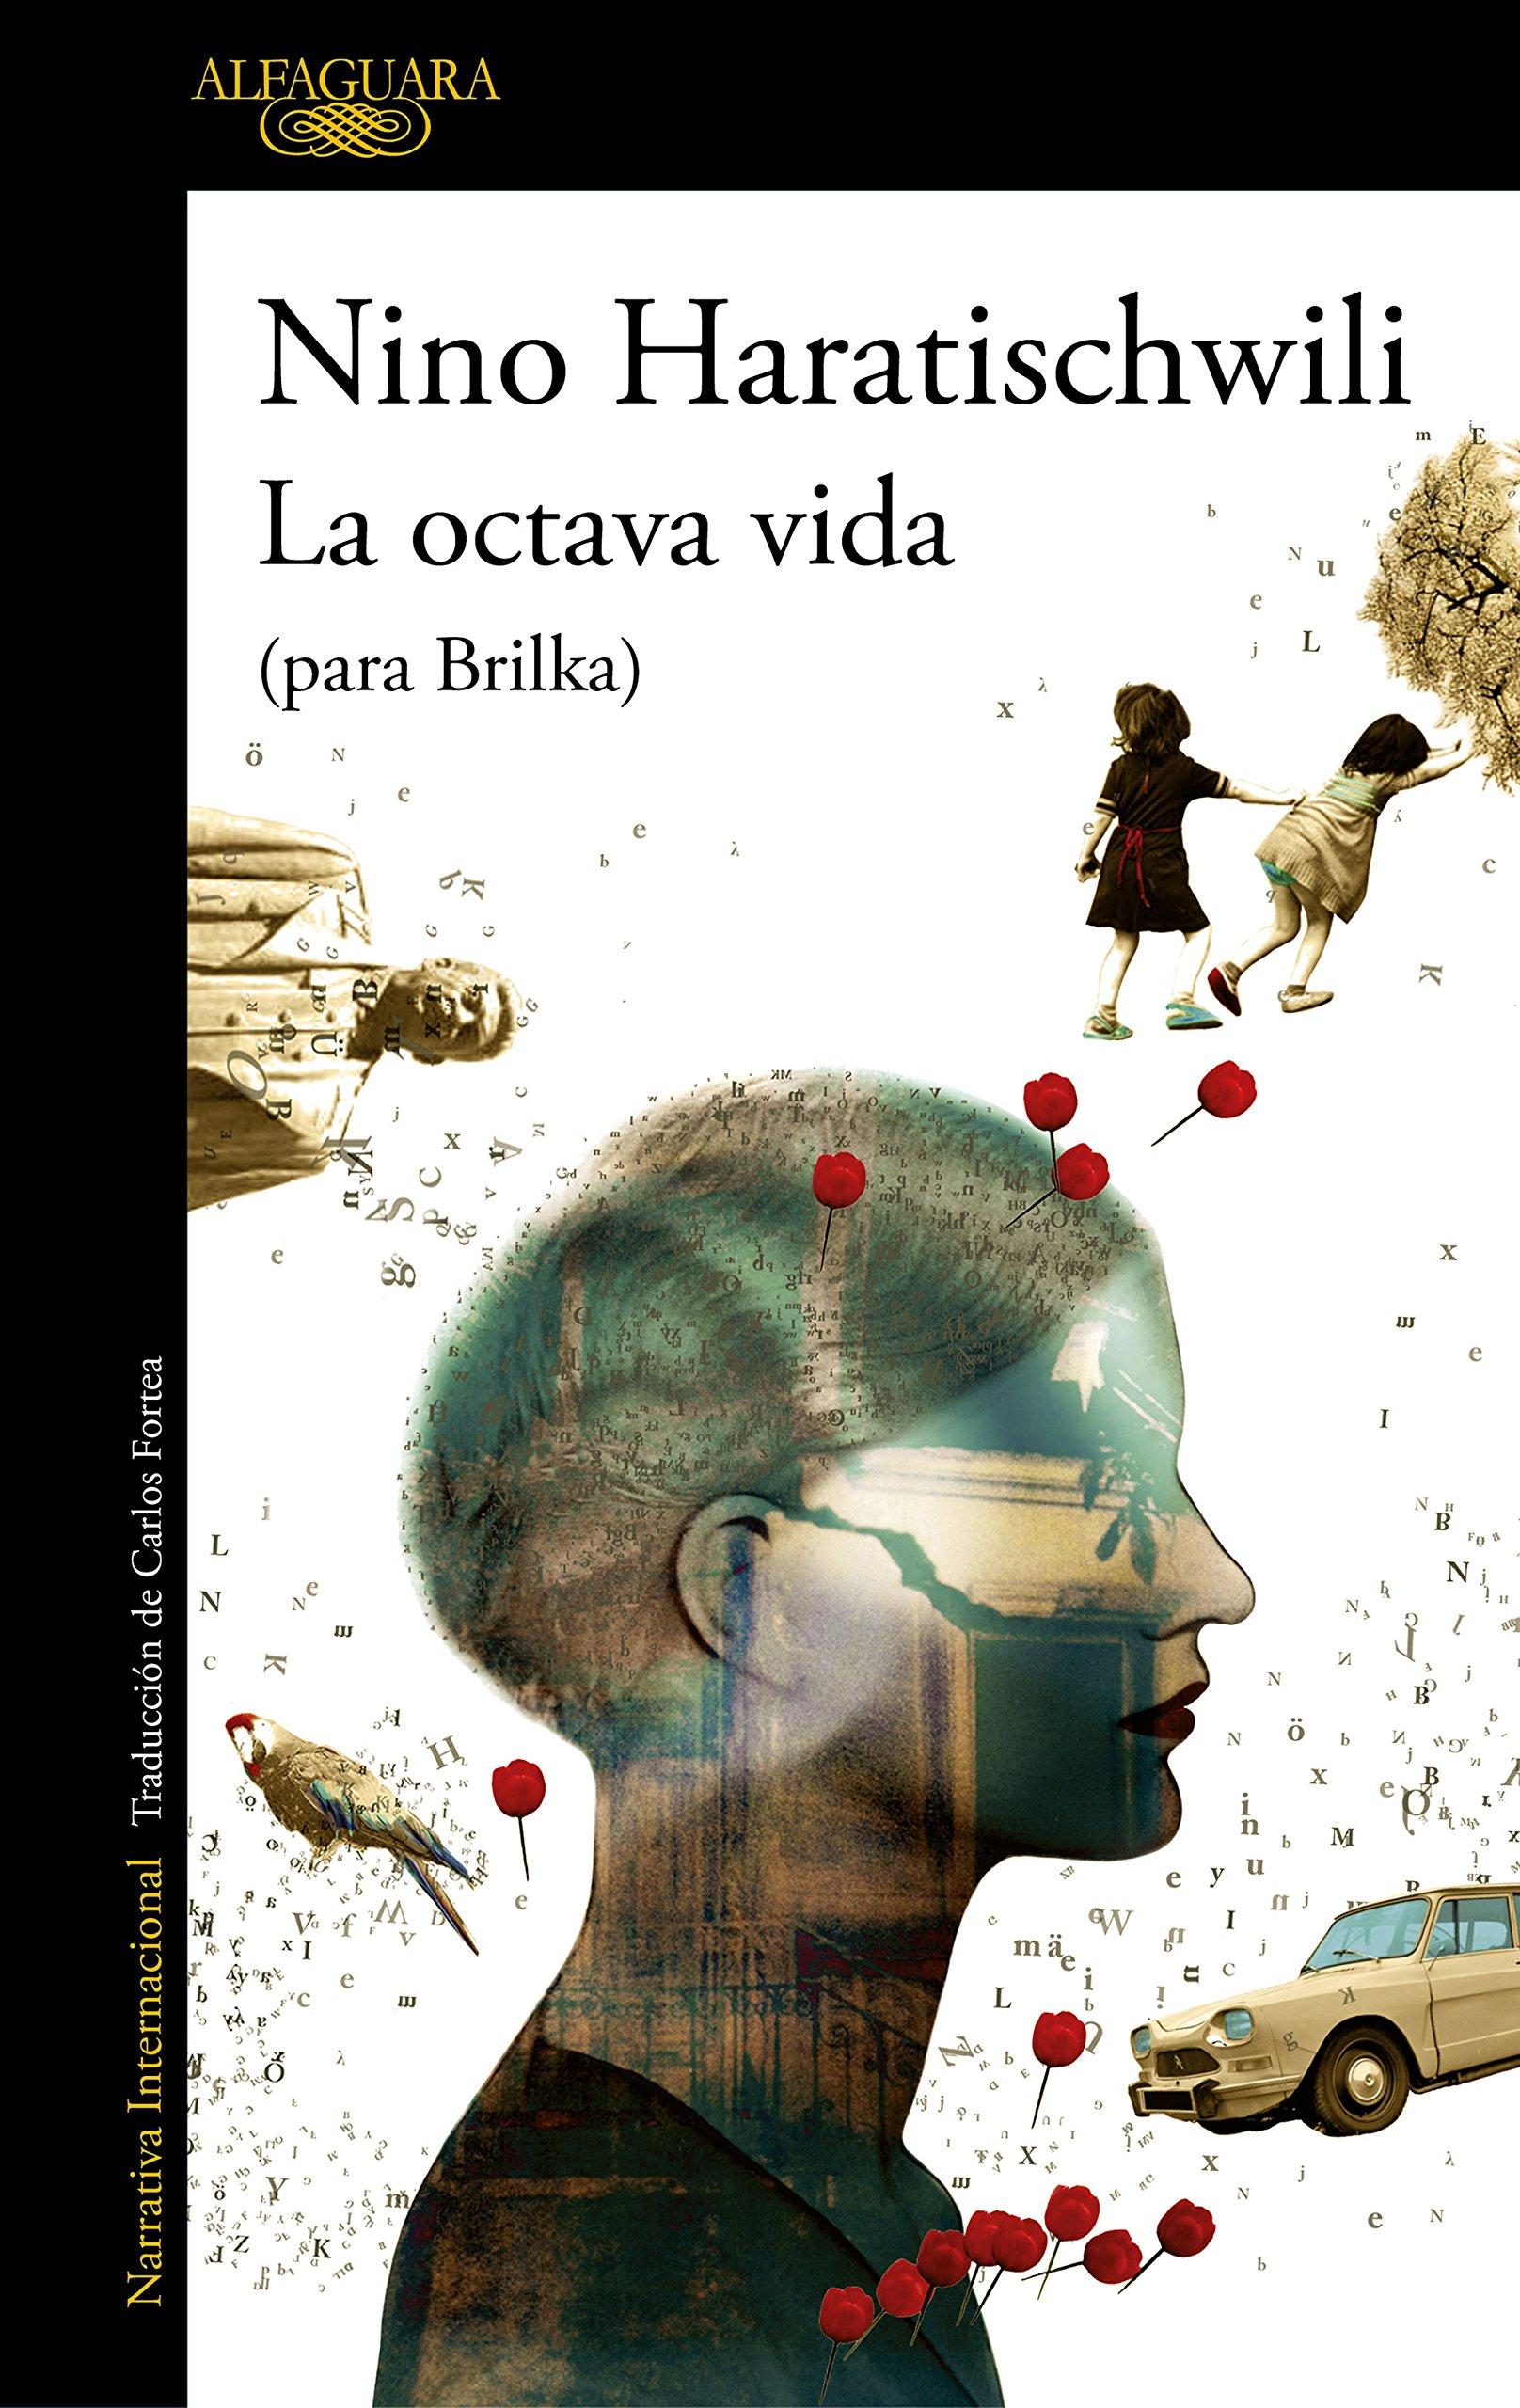 La octava vida (para Brilka) (LITERATURAS) Tapa blanda – 13 sep 2018 Nino Haratischwili ALFAGUARA 8420433241 FICTION / Sagas